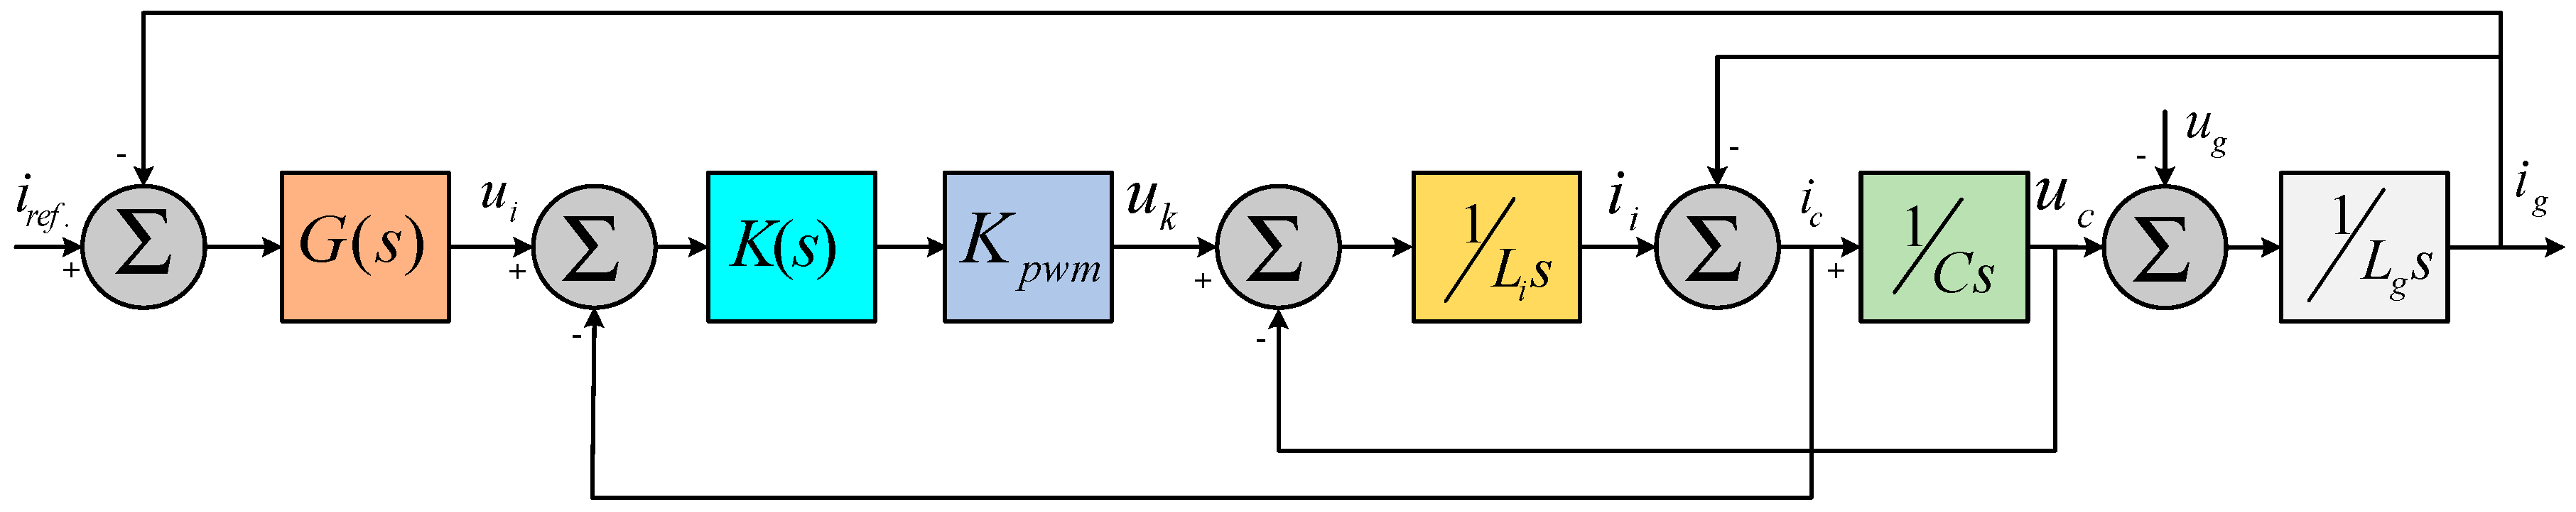 Diagram Additionally Electrical Ladder Diagram Symbols Besides Ladder